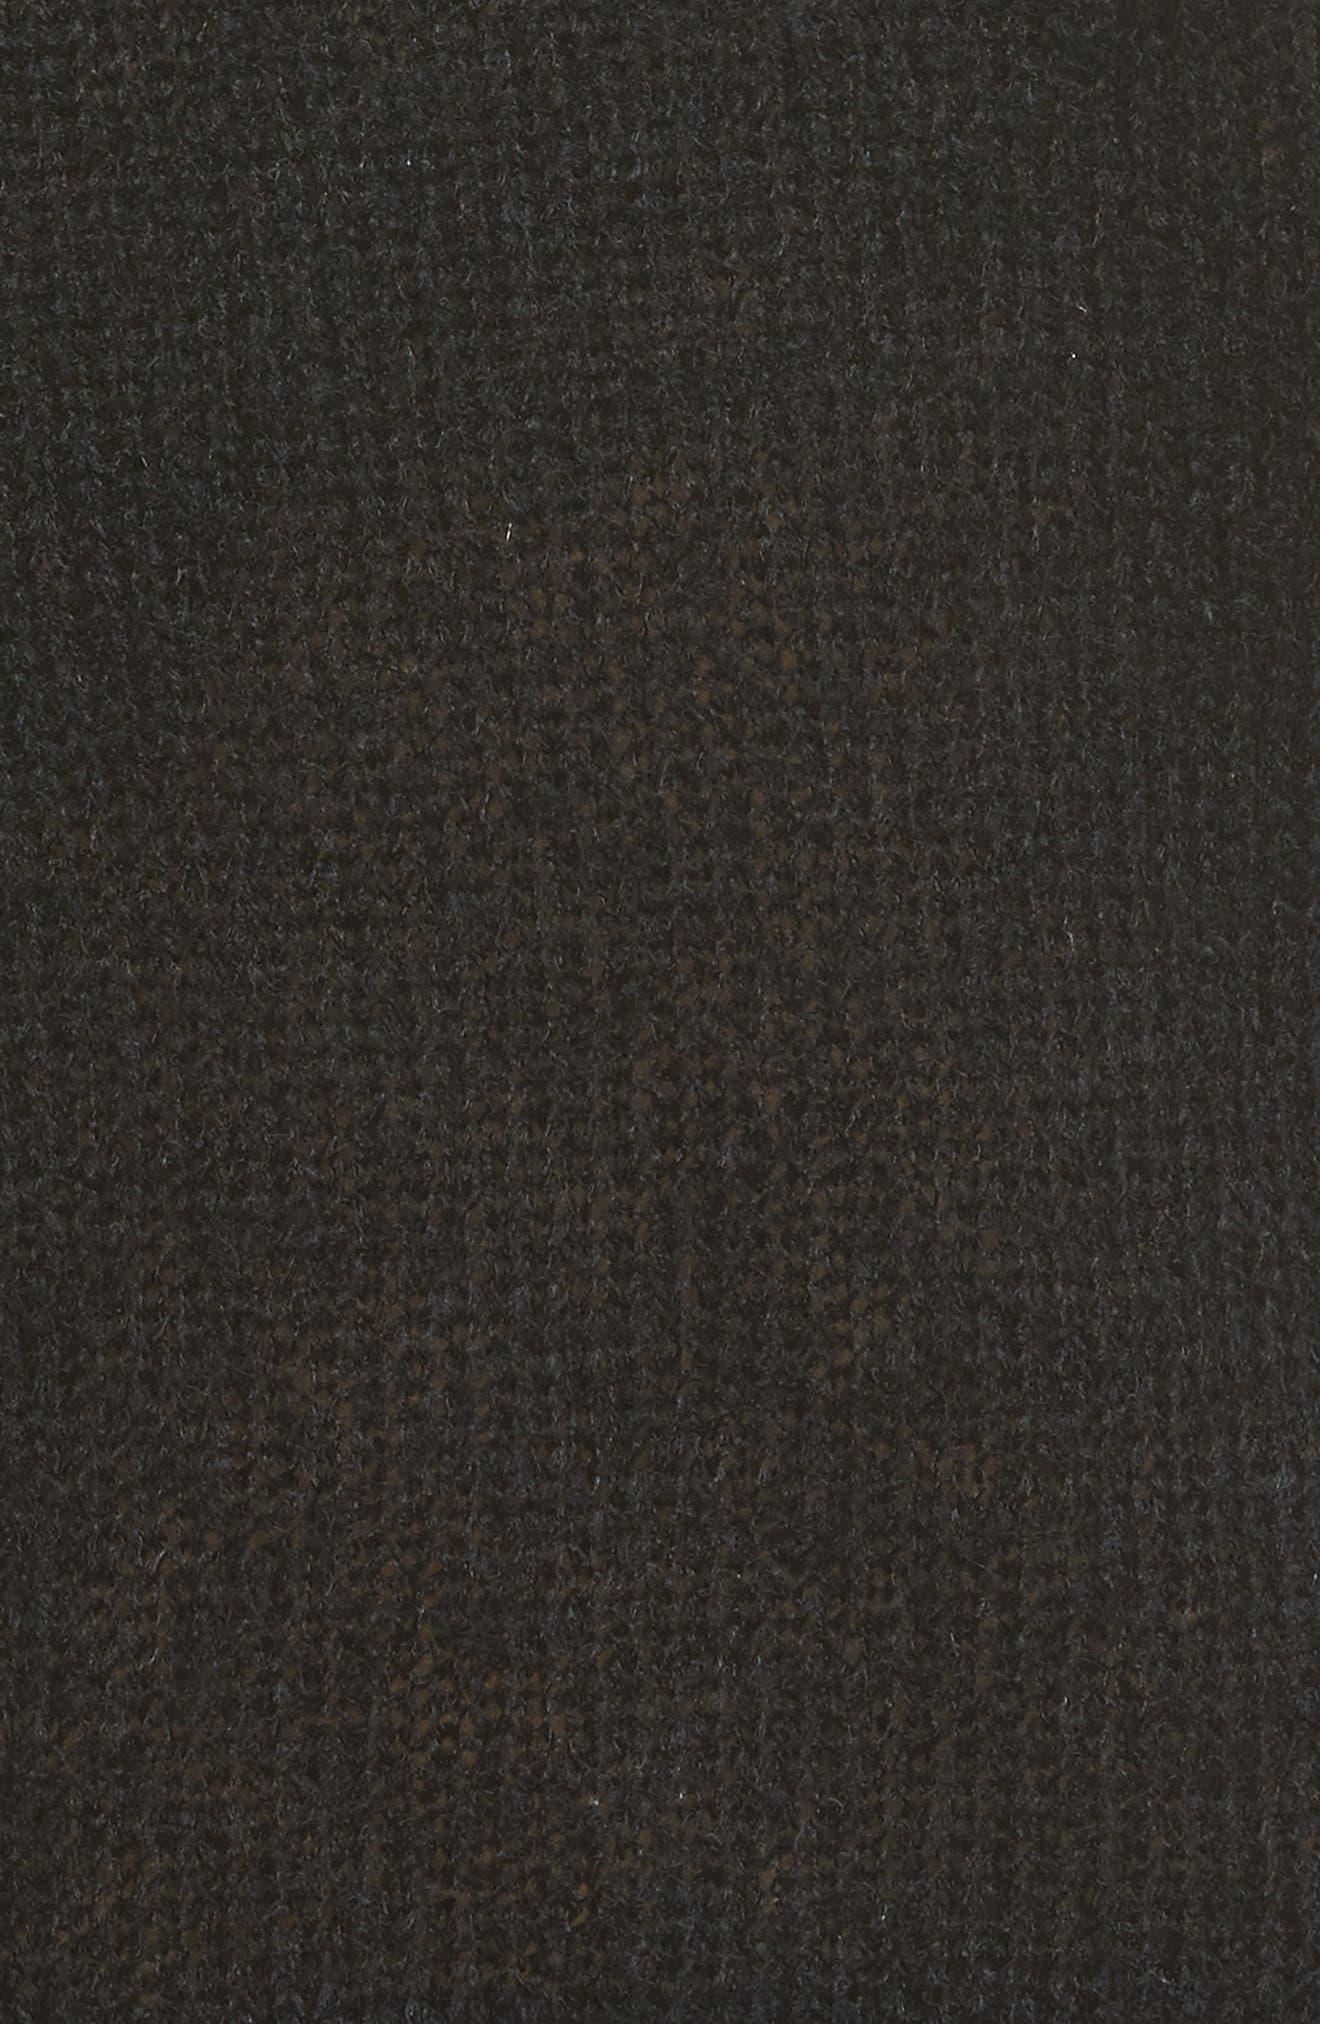 Ruffle One-Shoulder Sweater,                             Alternate thumbnail 5, color,                             Black